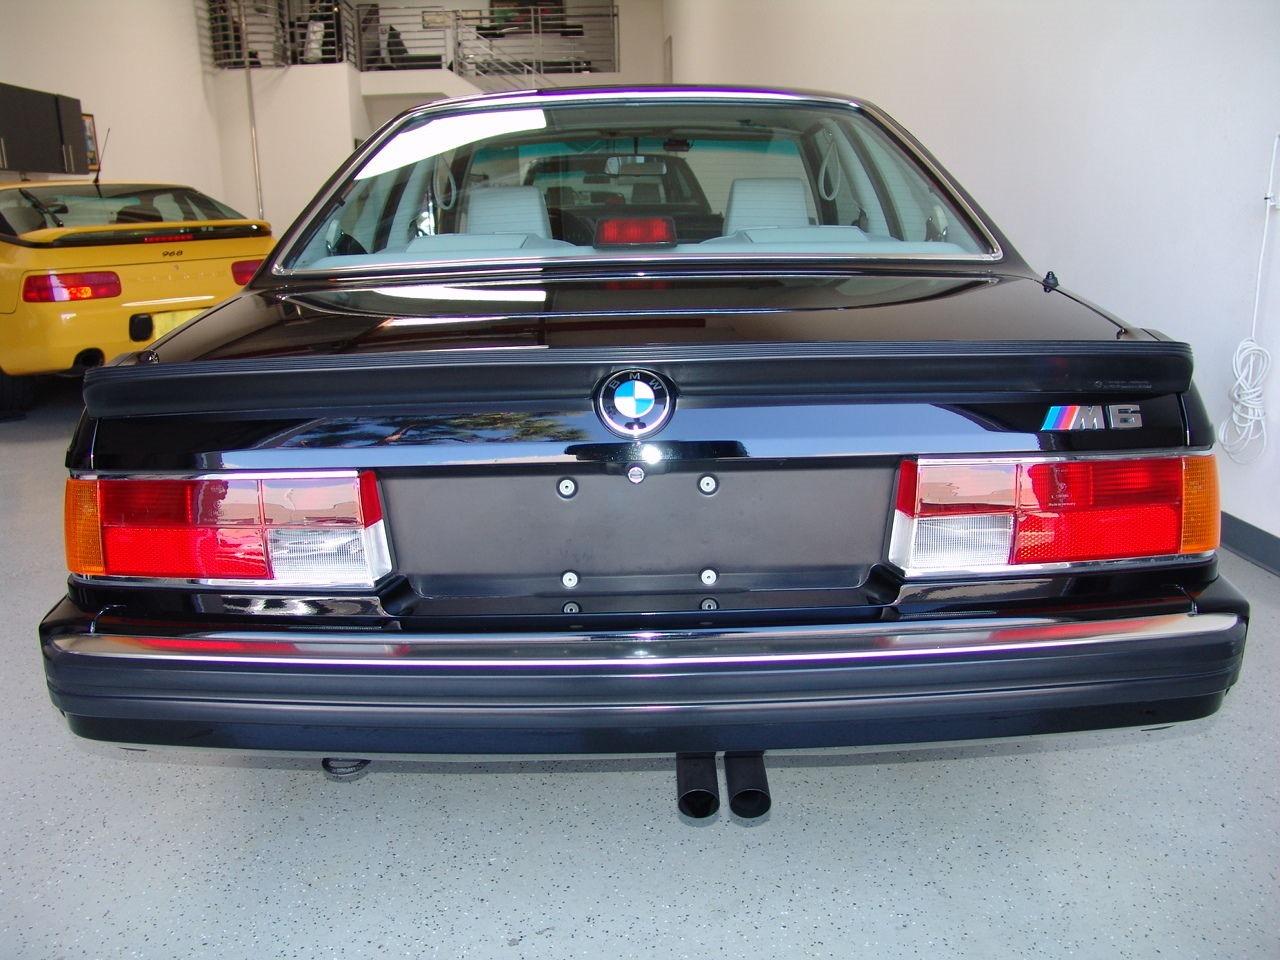 BMW M6 I (E24) 1983 - 1989 Coupe #4